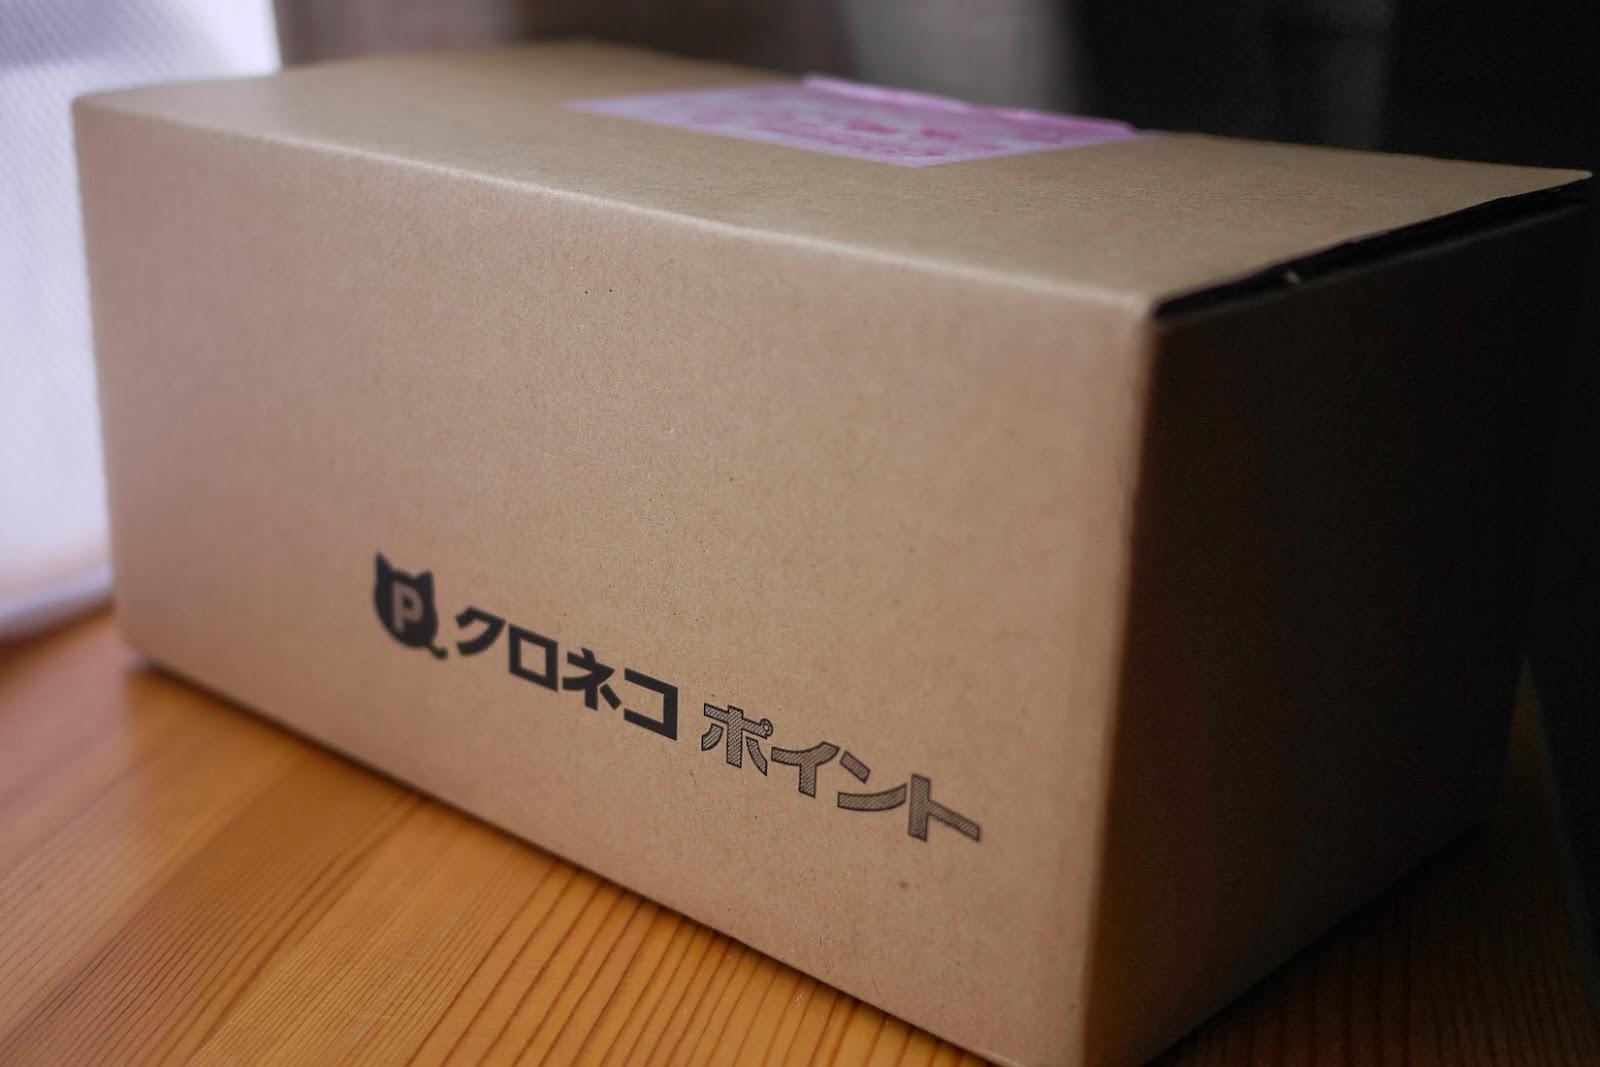 jagasuke blog: クロネコヤマトミニカー・10tトラック / クロネコメンバーズ